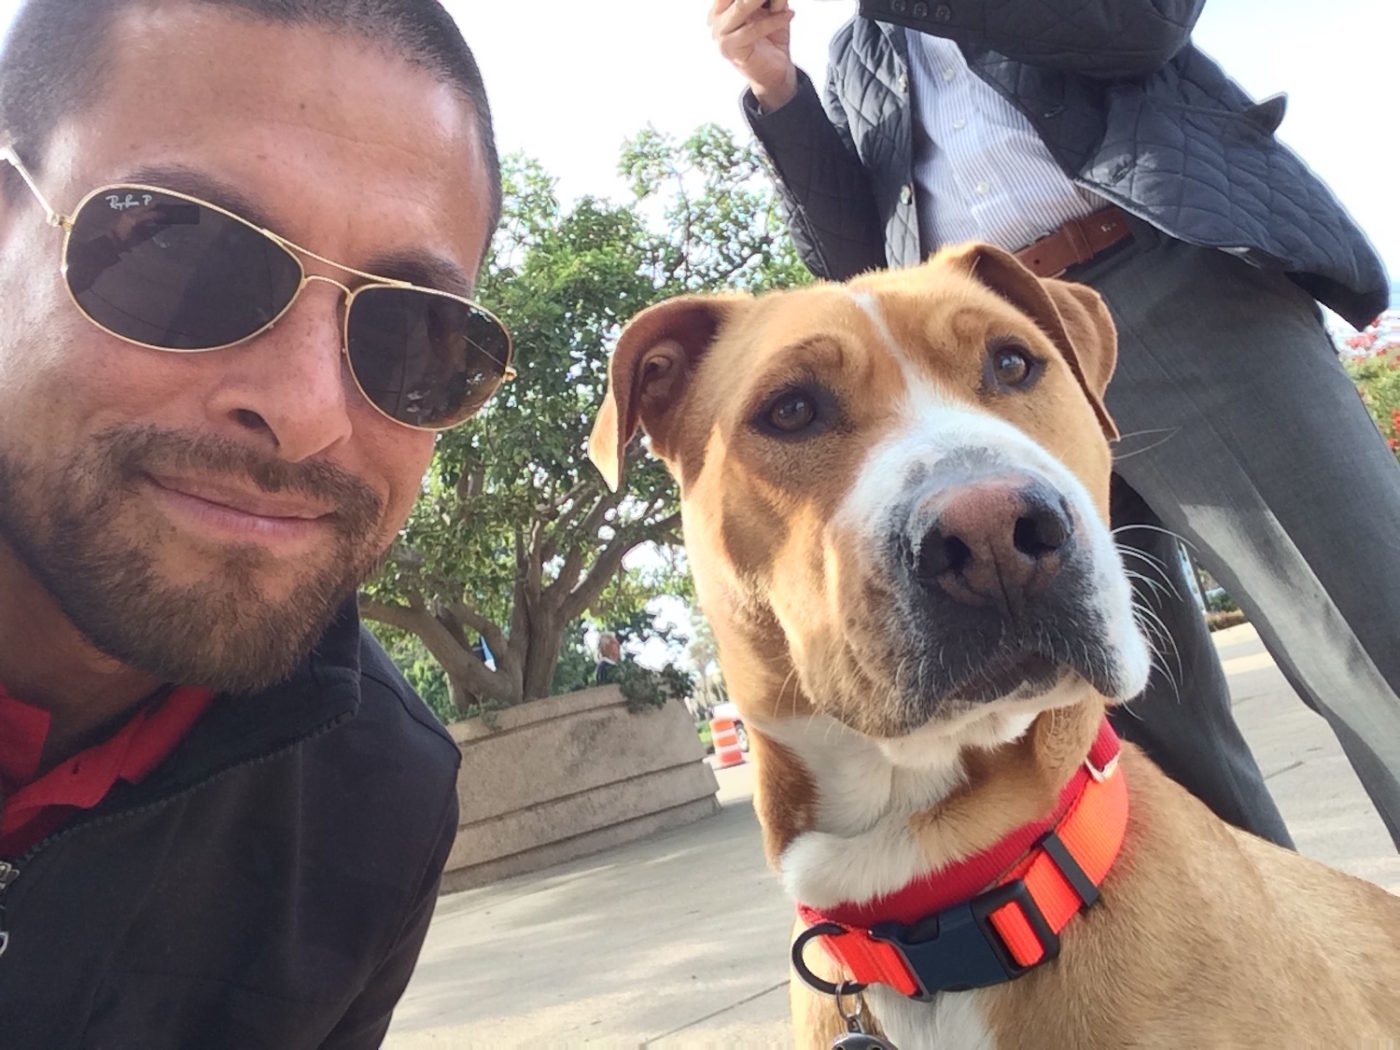 #cute #dogs #dogfriendly #positivedogtraining #BarkBustersHomeDogTrainingSanDiego